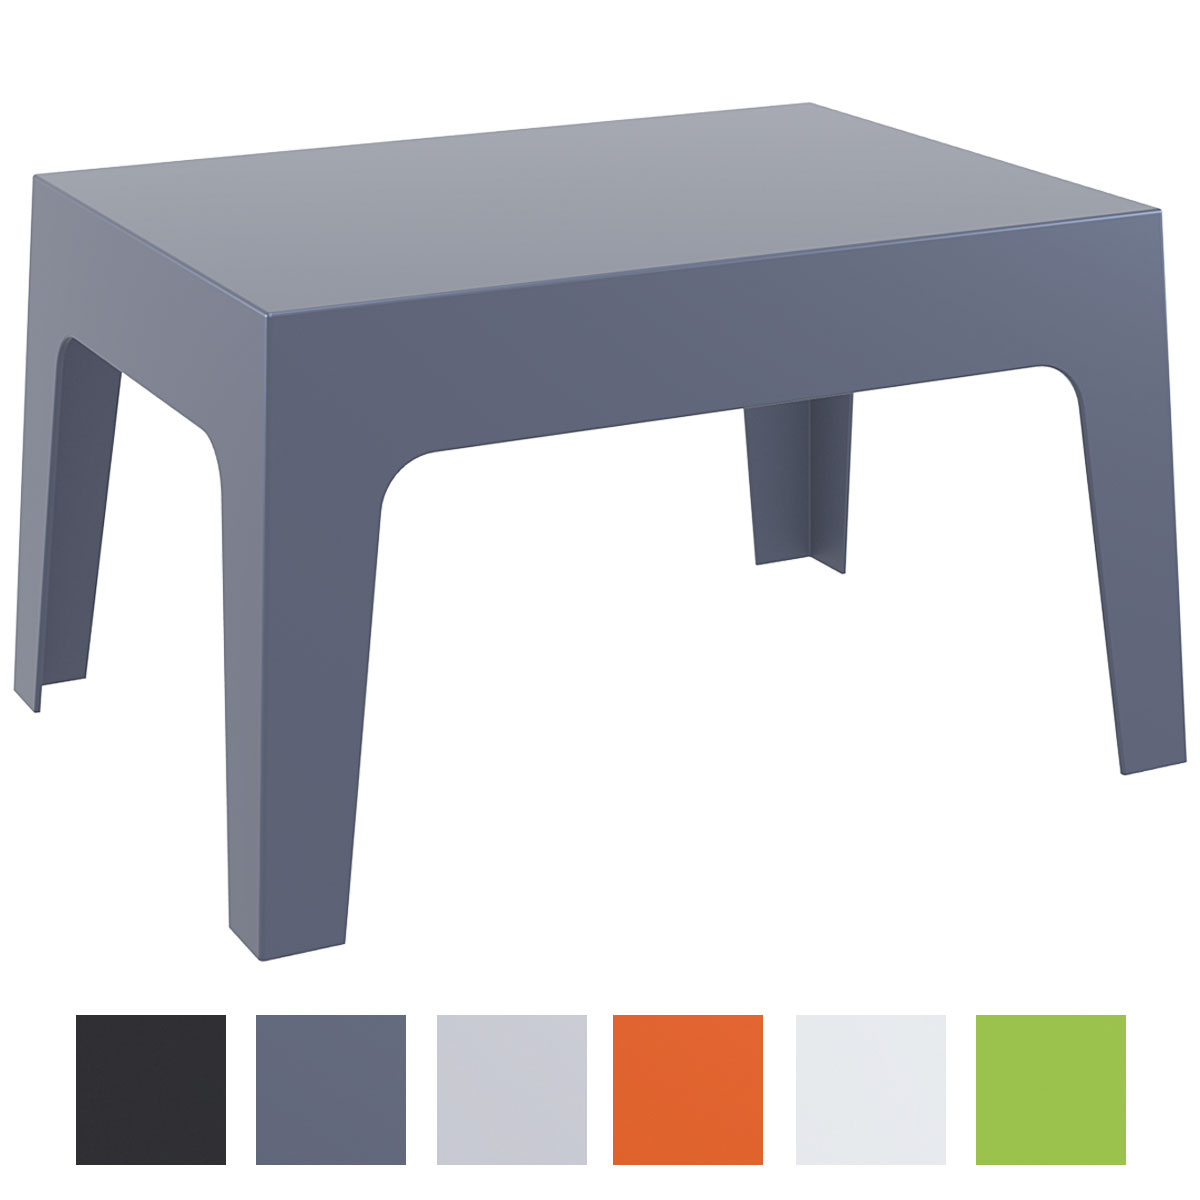 Table de jardin box table d 39 appoint en plastique table - Table de jardin plastique dur ...